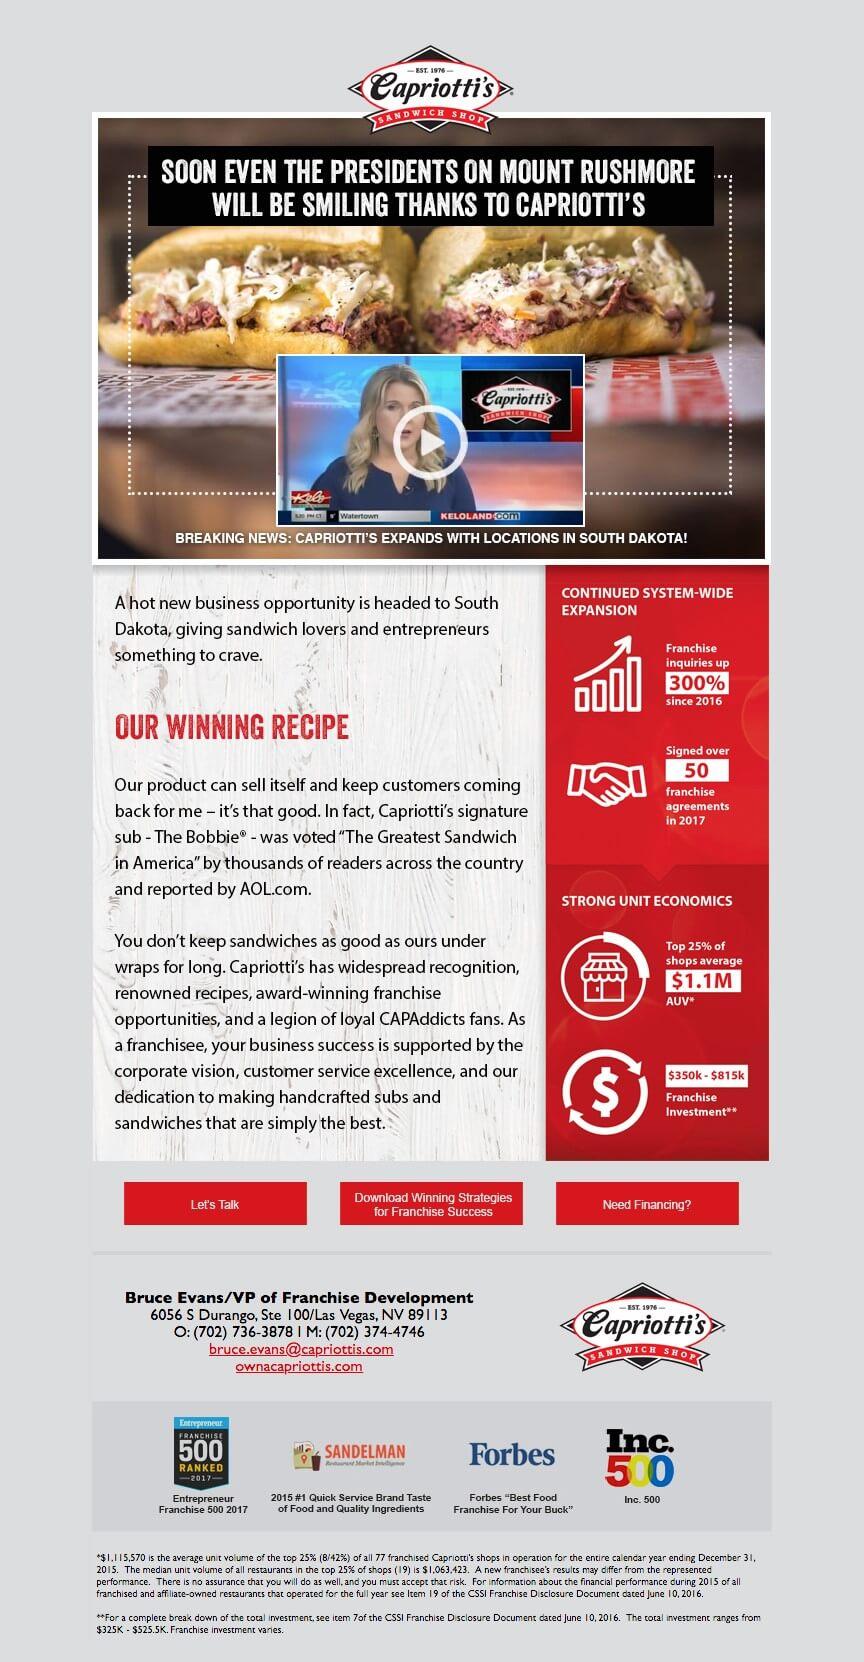 Capriottis Email Campaign